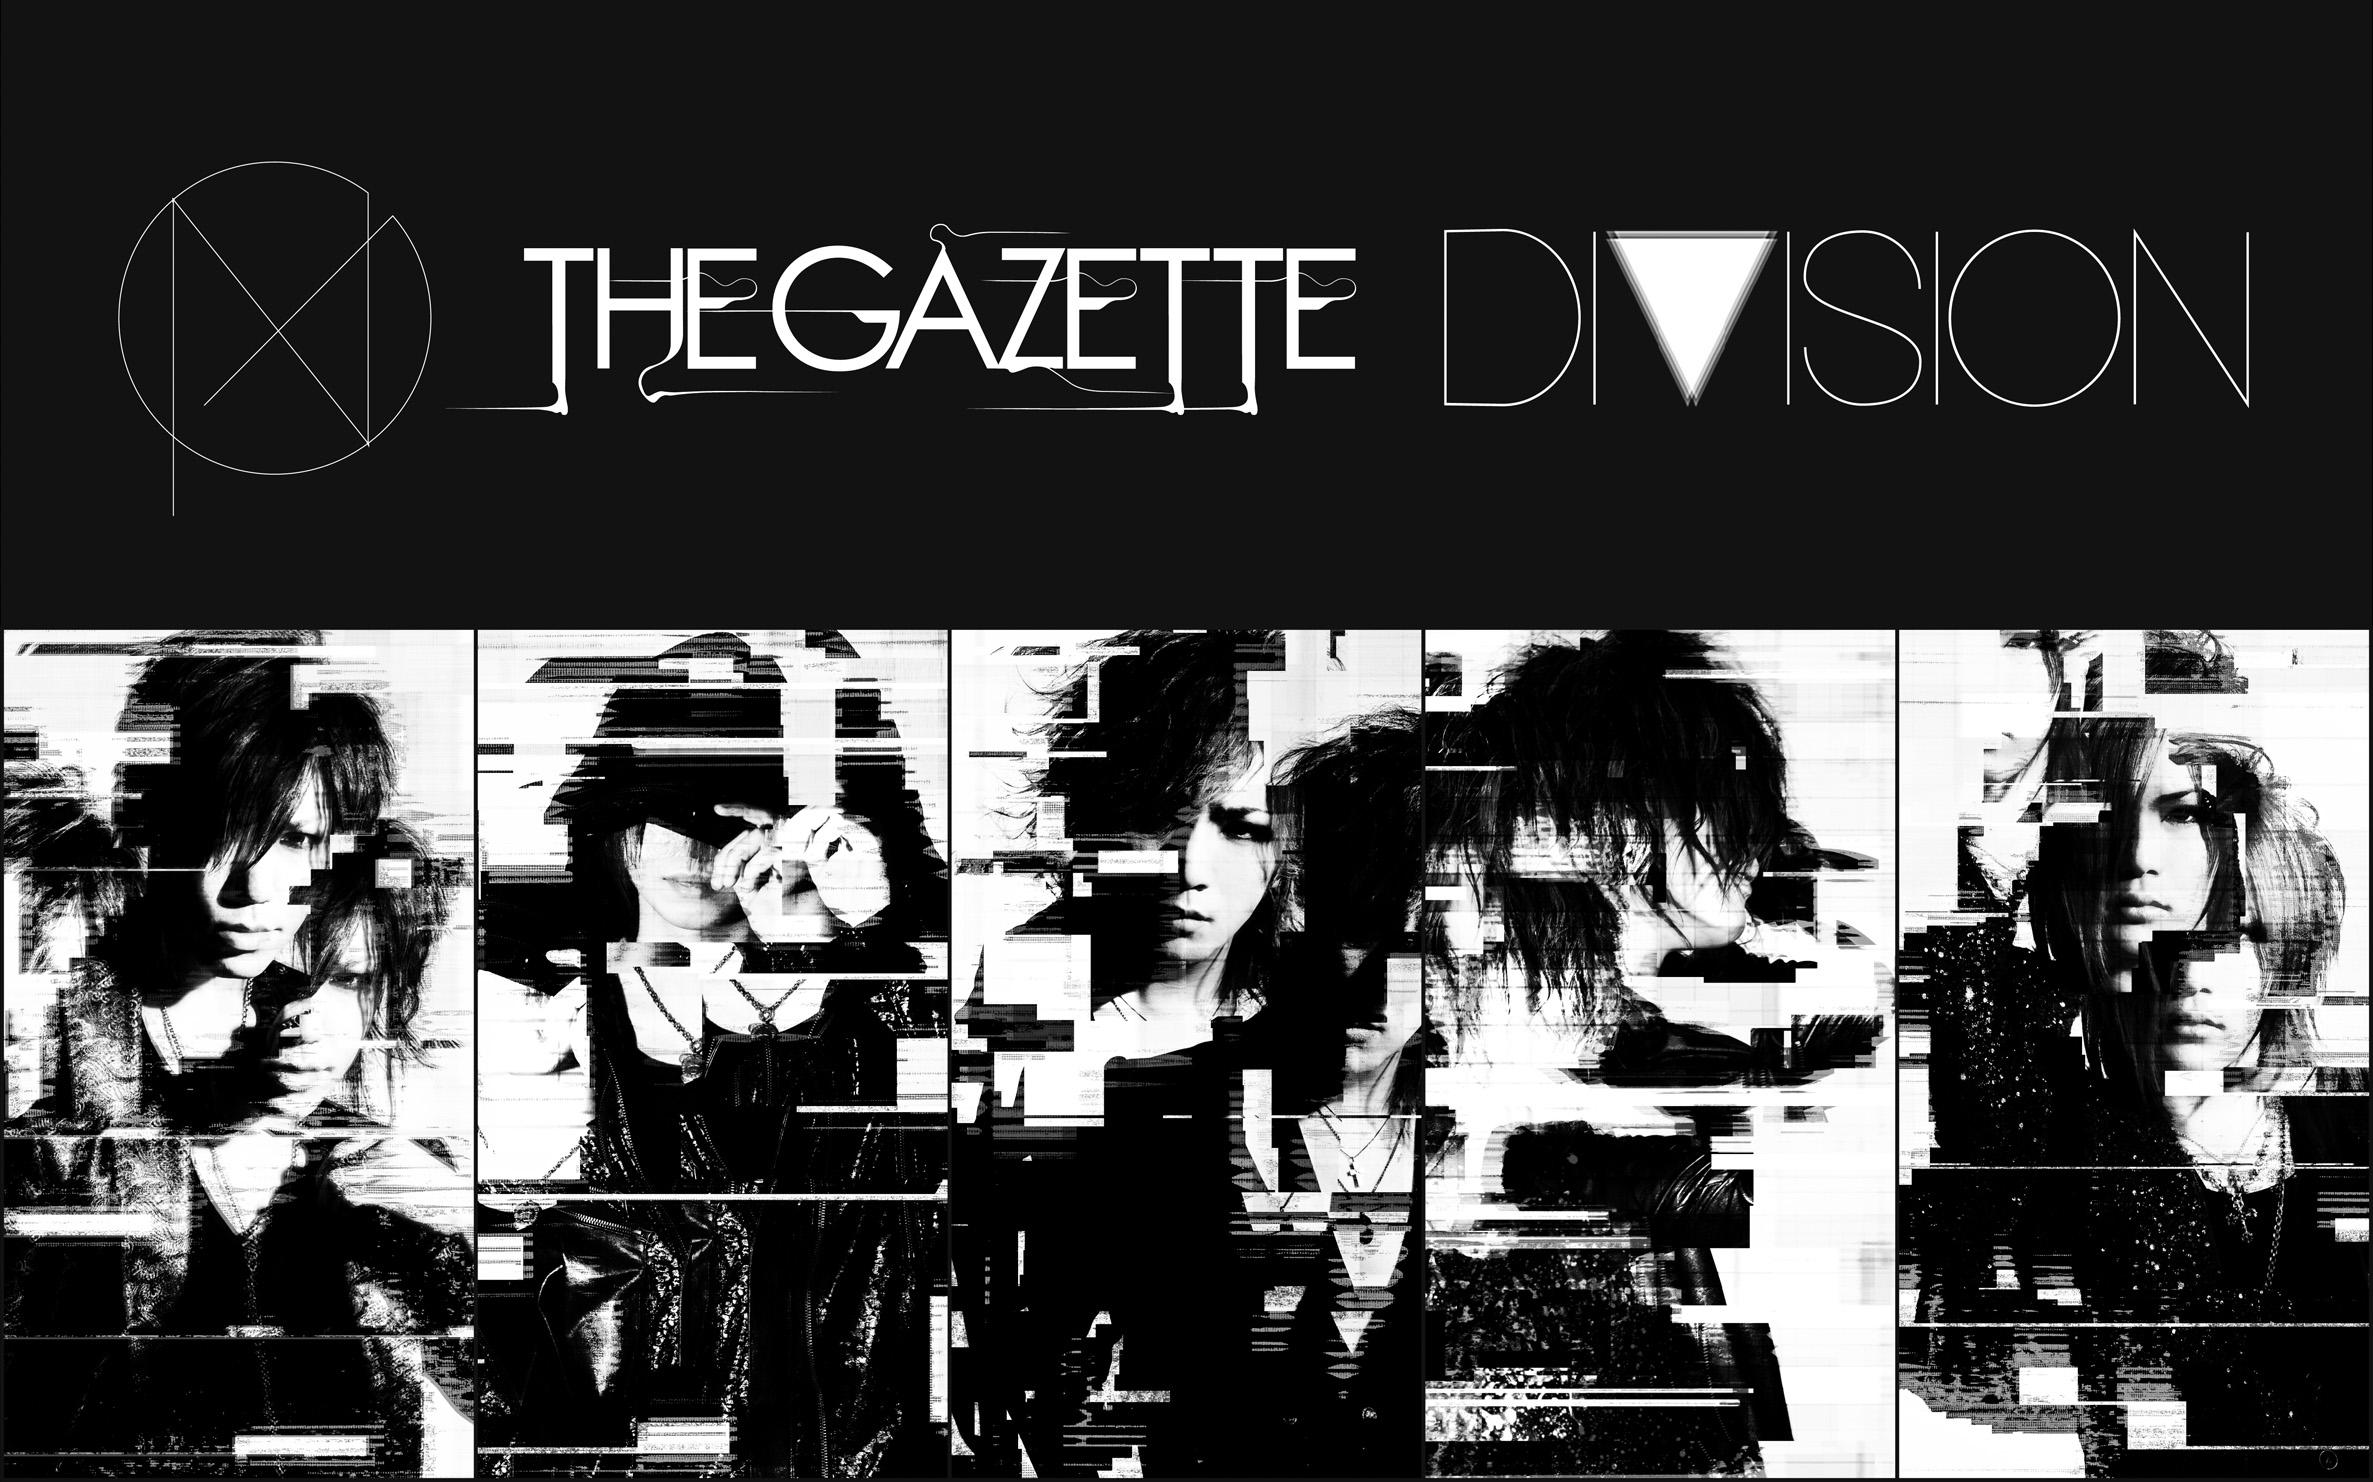 Best Wallpaper Logo Collage - illustration-digital-art-monochrome-collage-text-music-brand-The-Gazette-Division-black-and-white-monochrome-photography-font-album-cover-258913  Graphic_723138.jpg